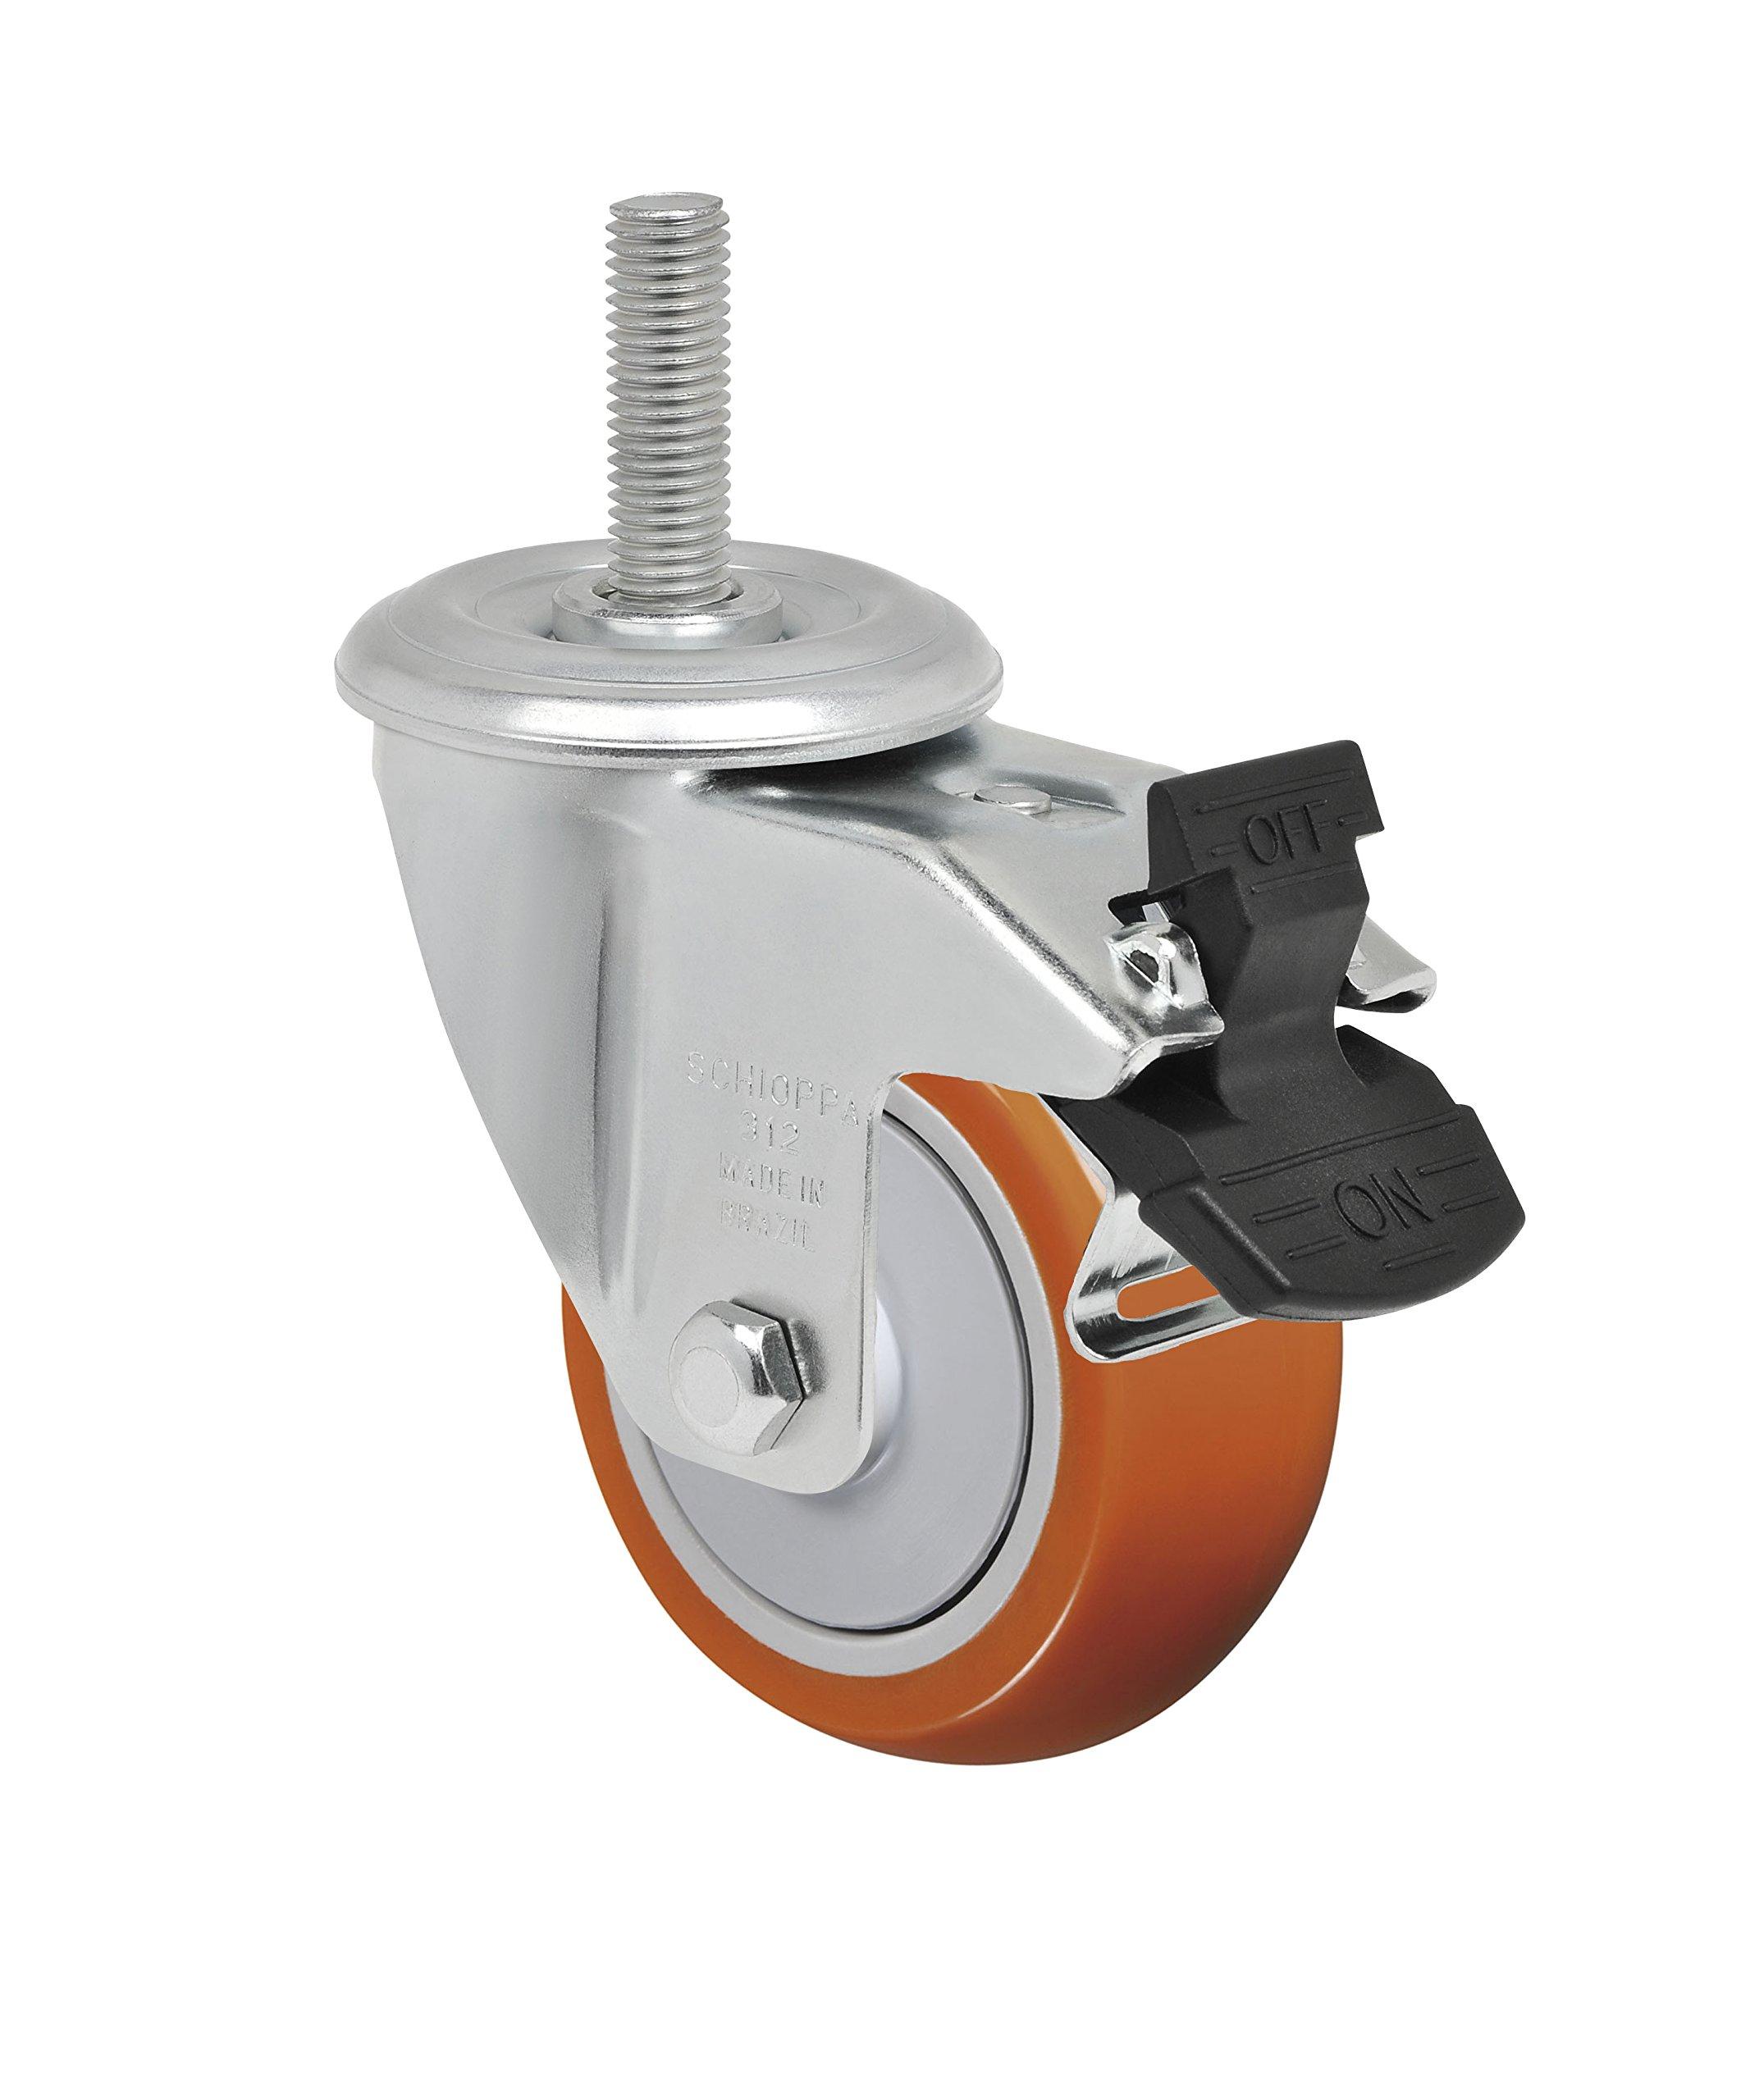 Schioppa L12 Series, GLEIH 312 UPE G, 3 x 1-1/4'' Swivel Caster with Total Lock Brake, Non-Marking Polyurethane Precision Ball Bearing Wheel, 175 lbs, 1/2'' Diameter x 2'' Length Threaded Stem